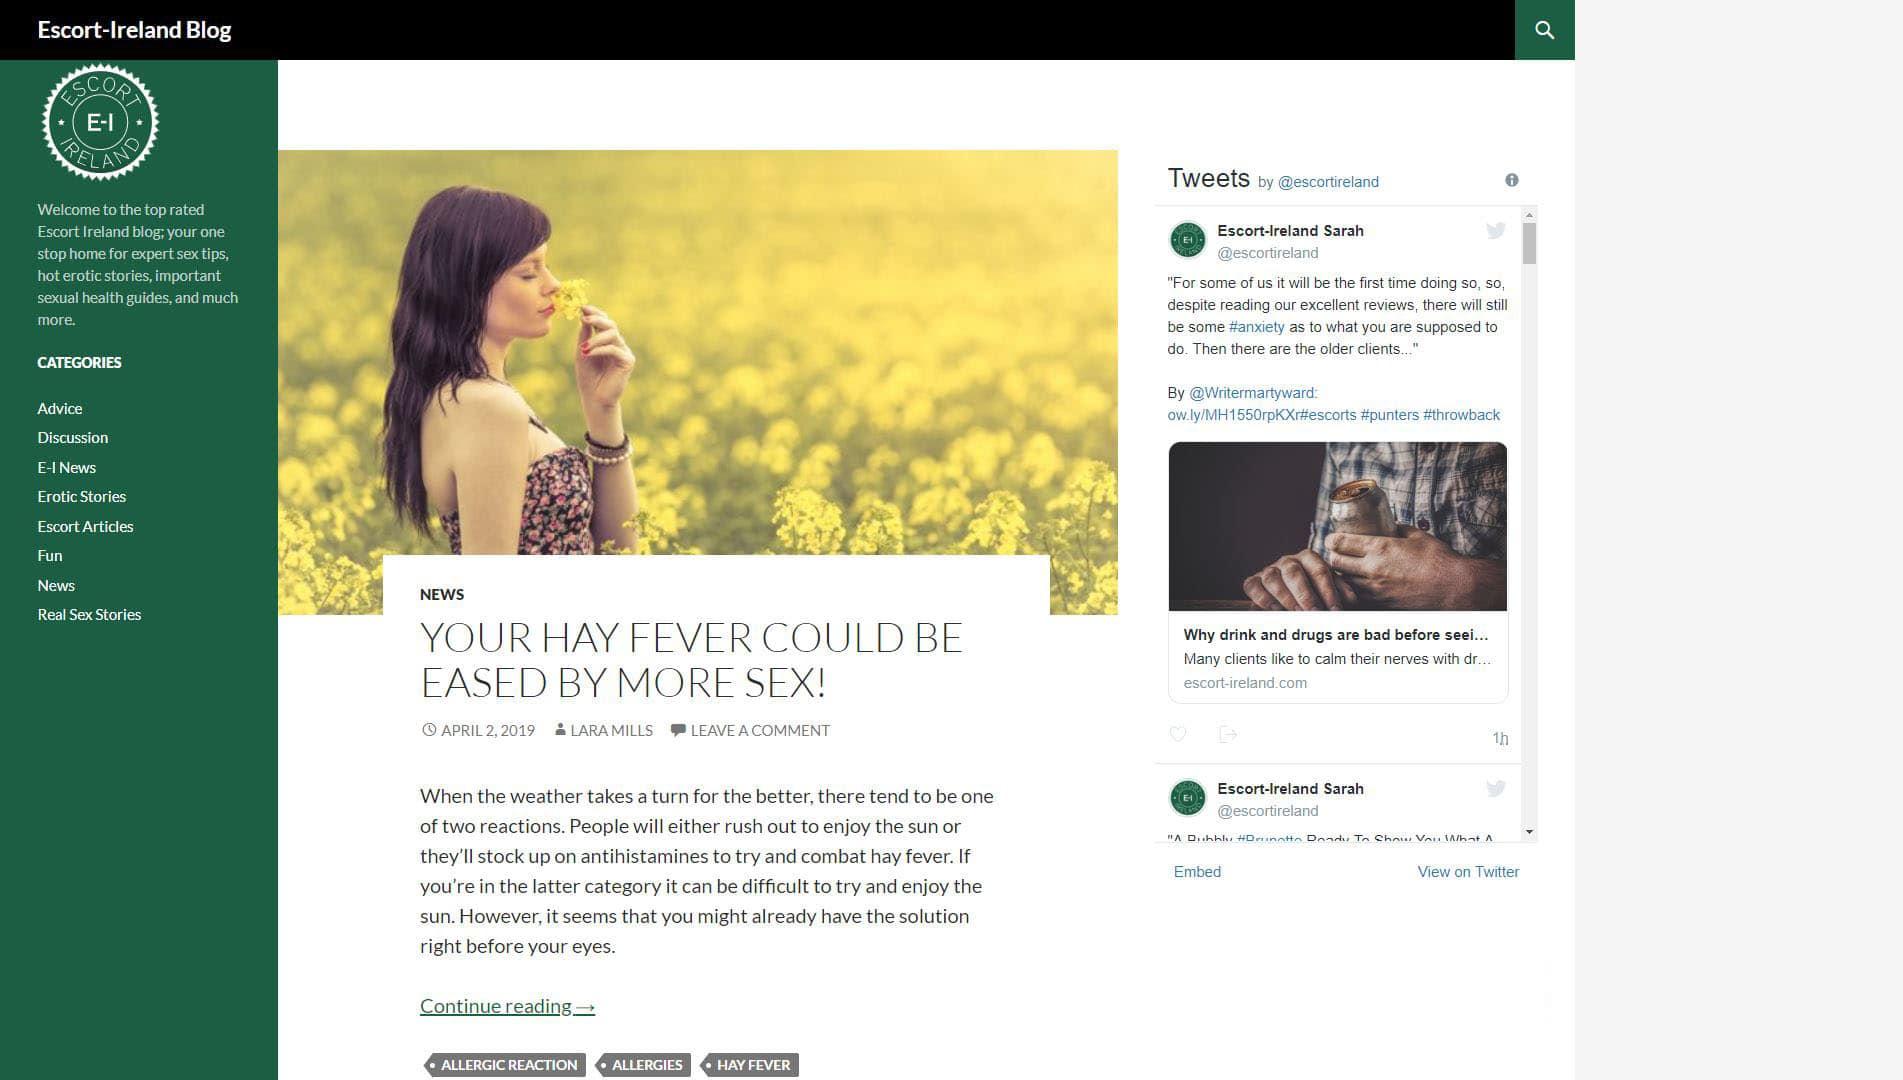 Escort-Ireland Blog